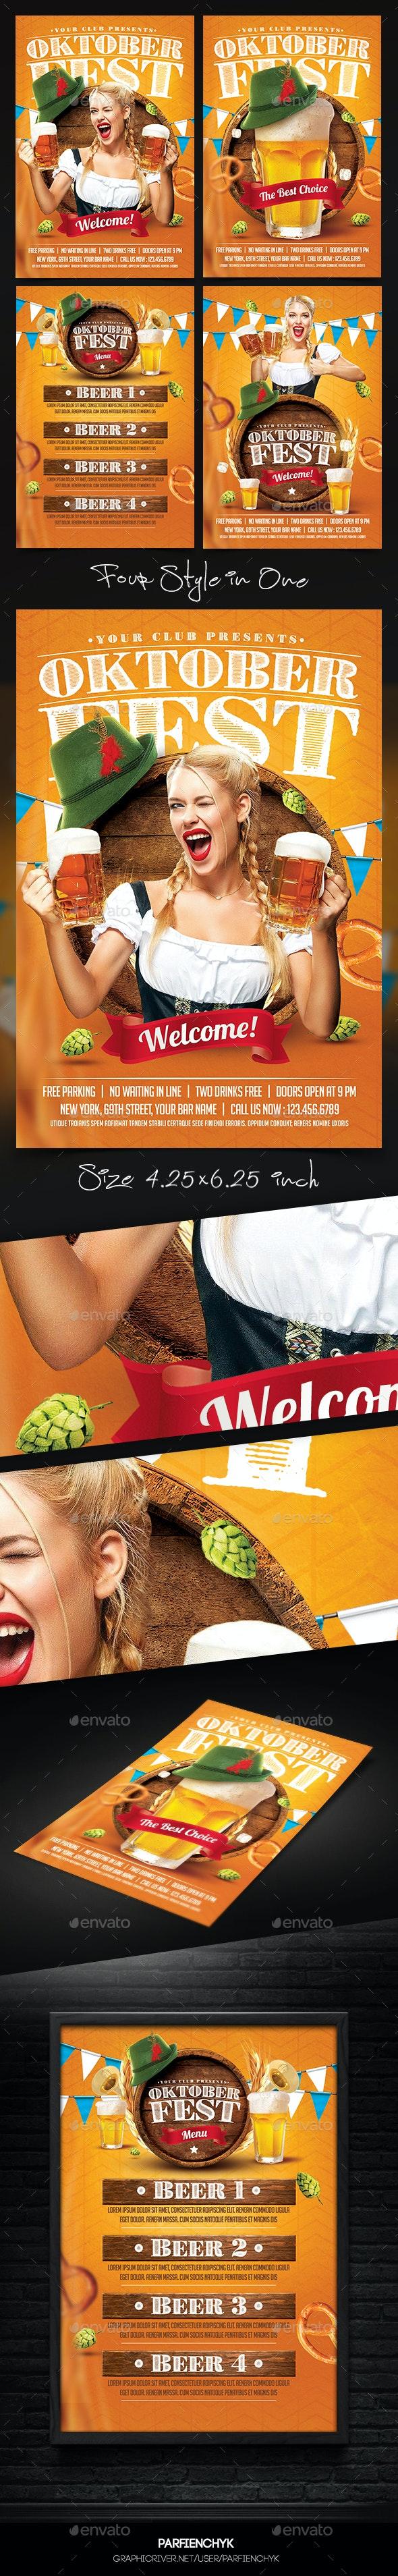 Oktoberfest Flyer - Clubs & Parties Events